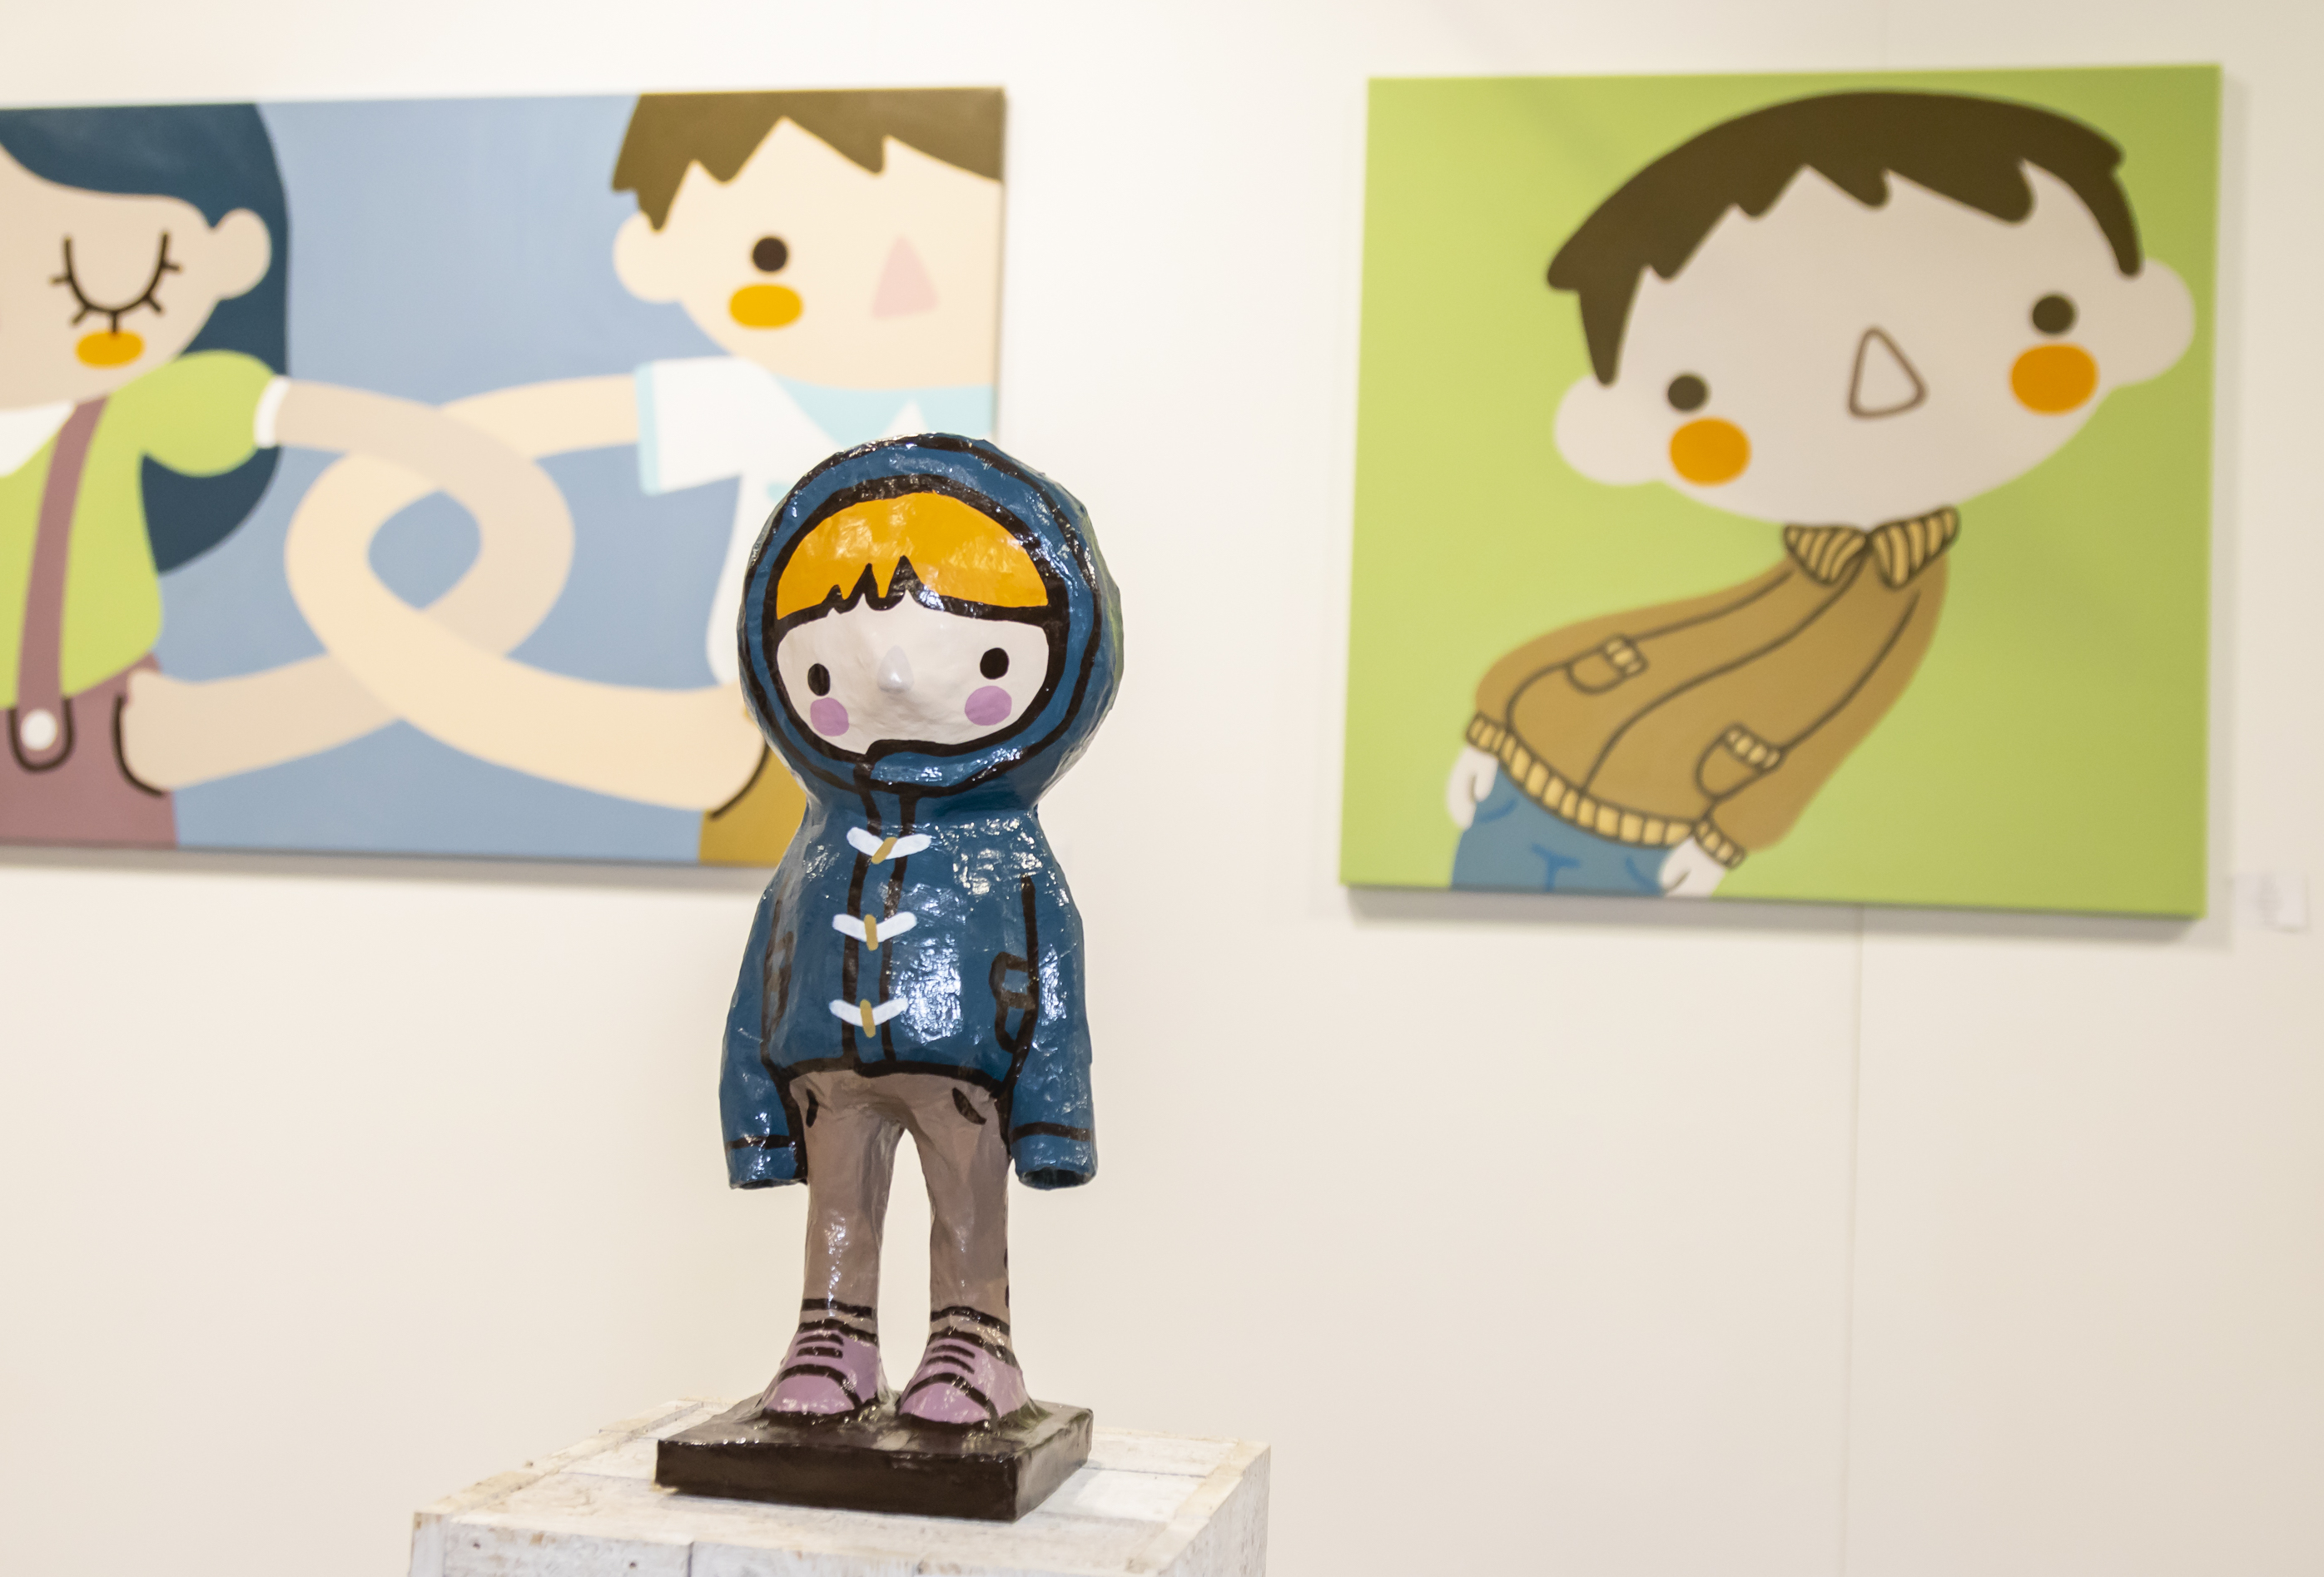 Ale Puro's work at Affordable Art Fair Milano